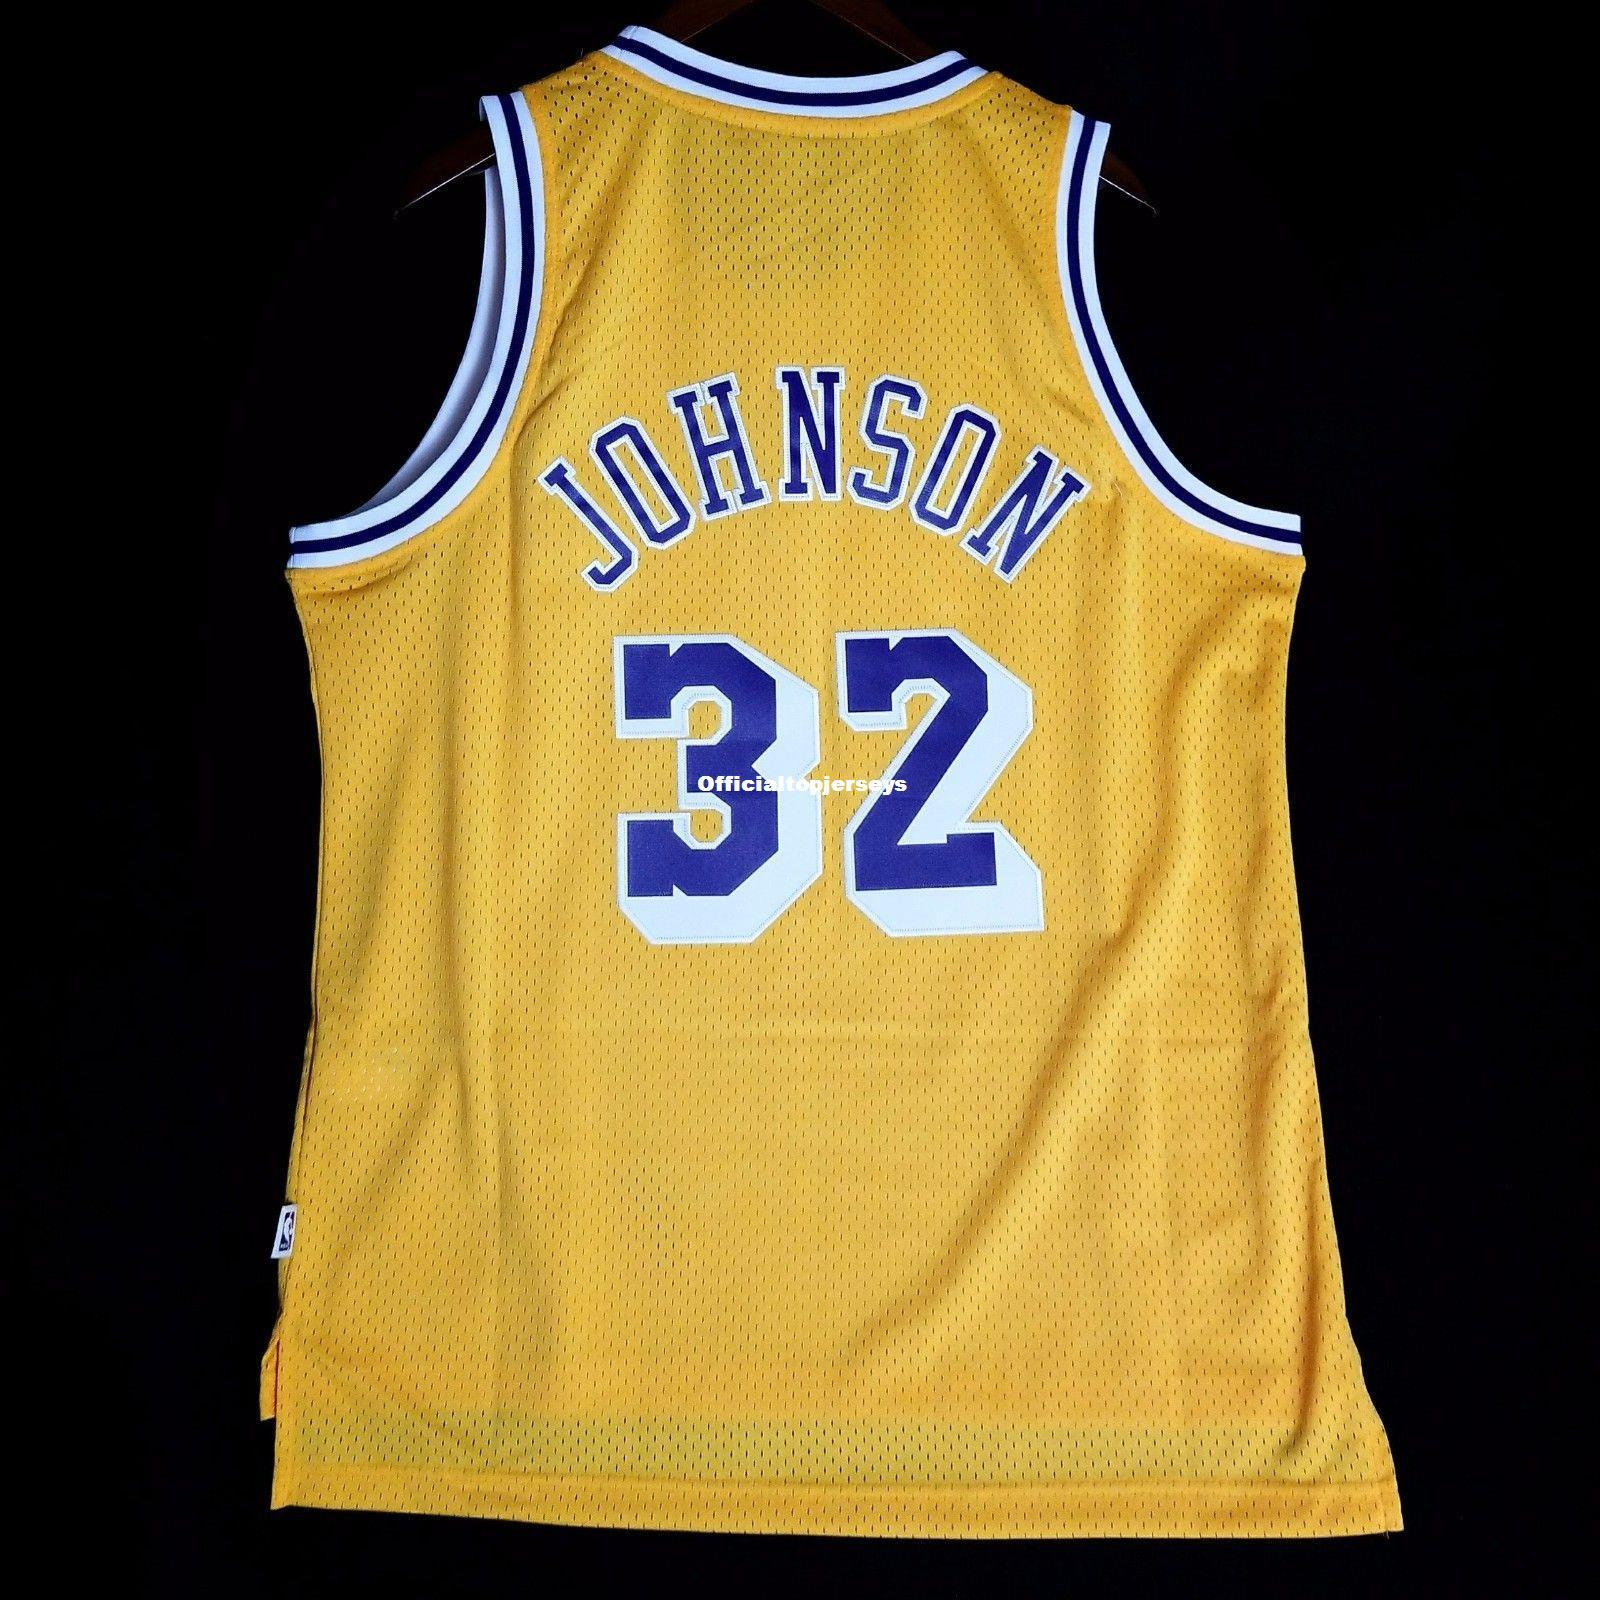 916a7c8caf7b 2019 100% Stitched  32 Johnson Soul Vest Wholesale Yellow Jersey Kobe Mens  Vest Size XS 6XL Stitched Basketball Jerseys Ncaa From Officialtopjerseys